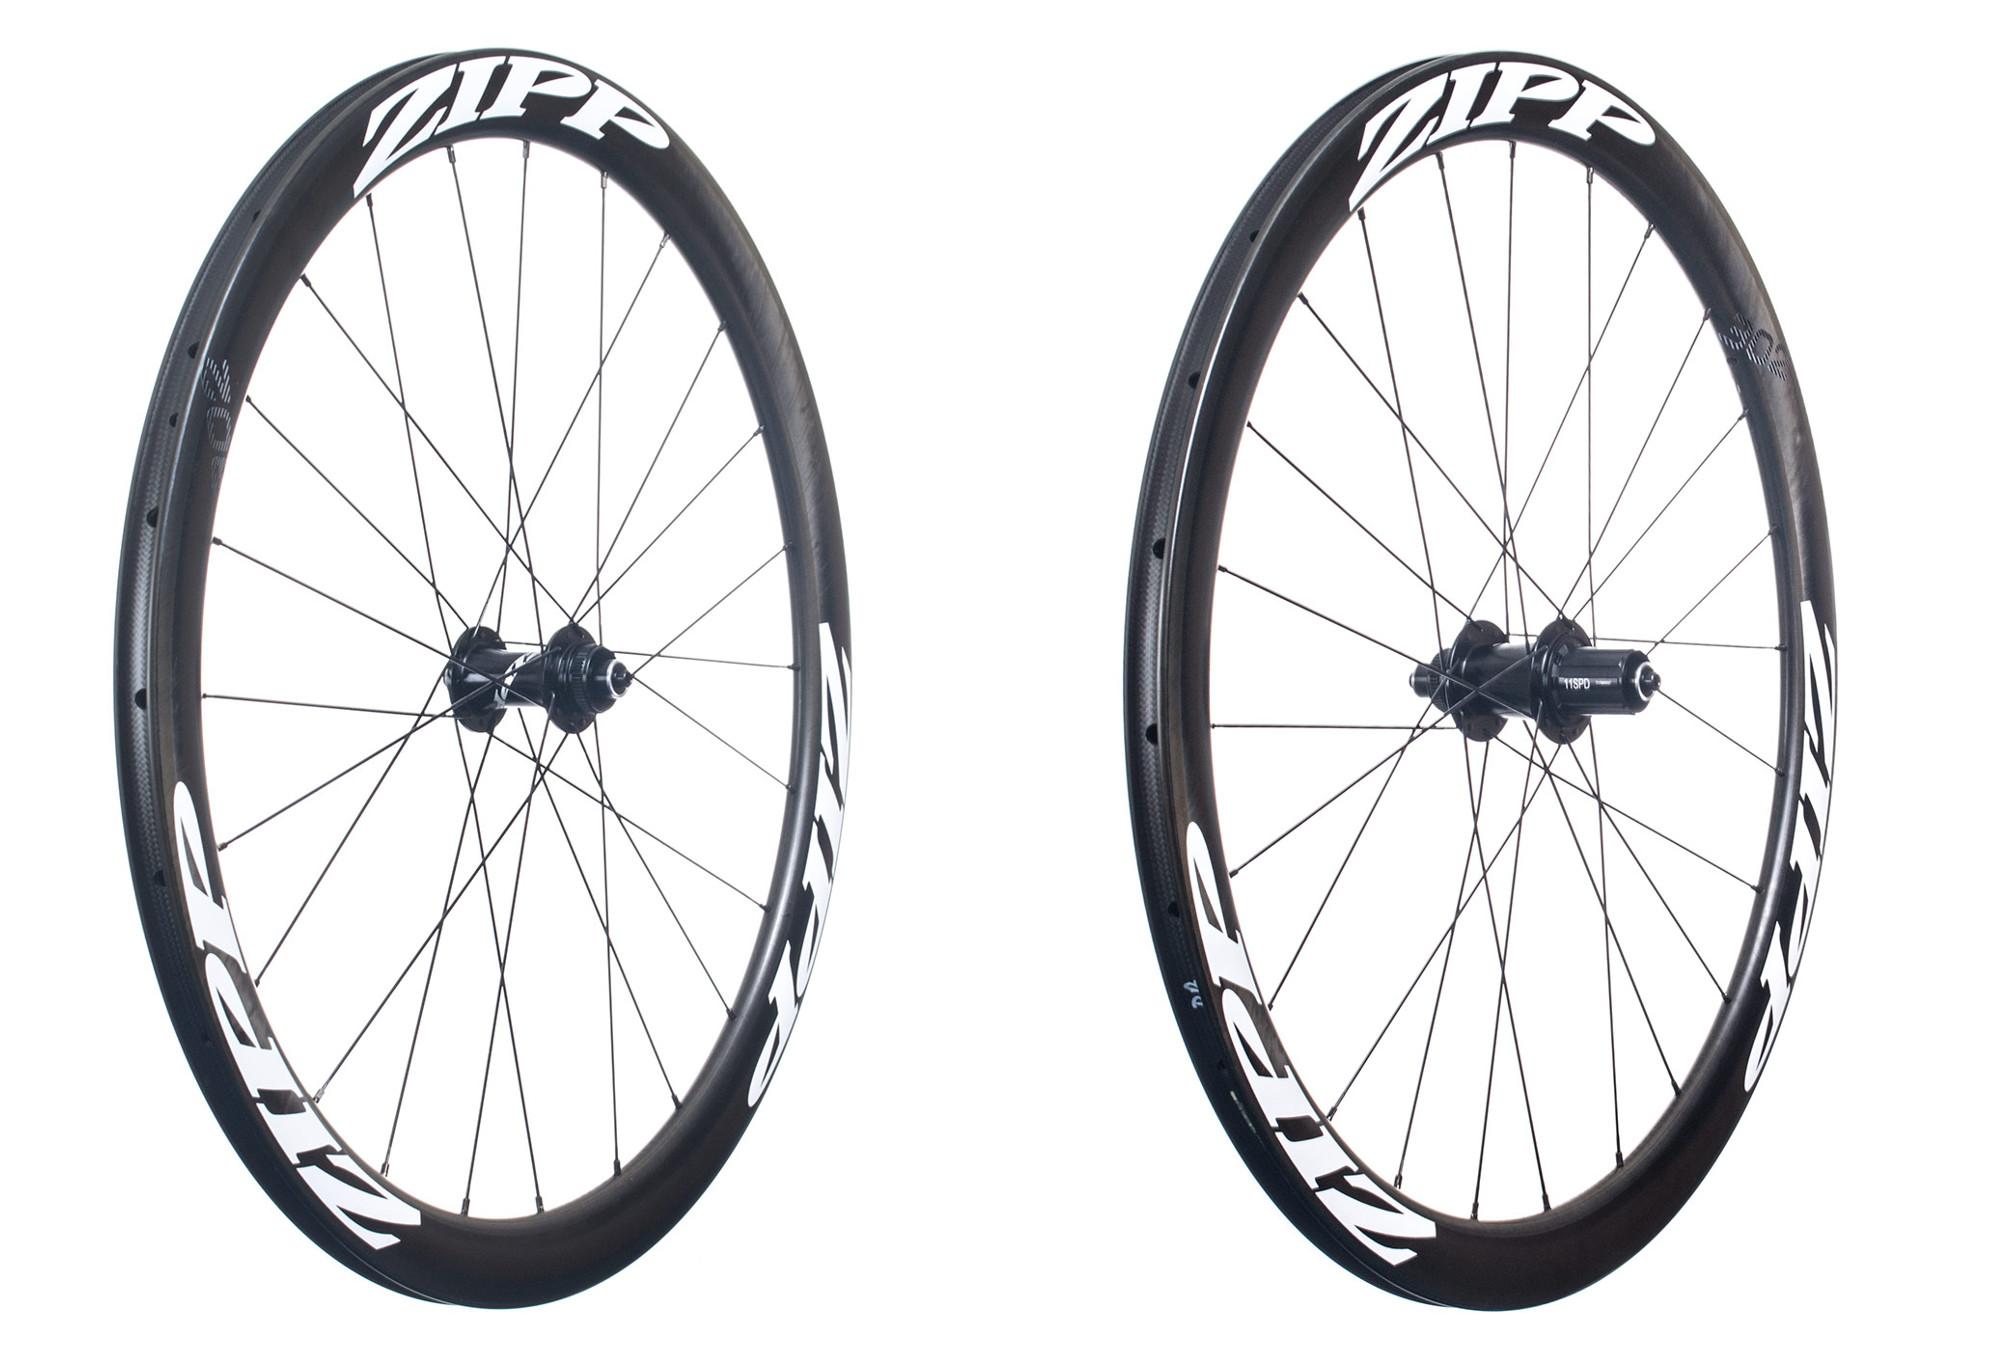 Zipp 302 disc wheelset clincher white stickers body shimano sram 11s alltricks fr